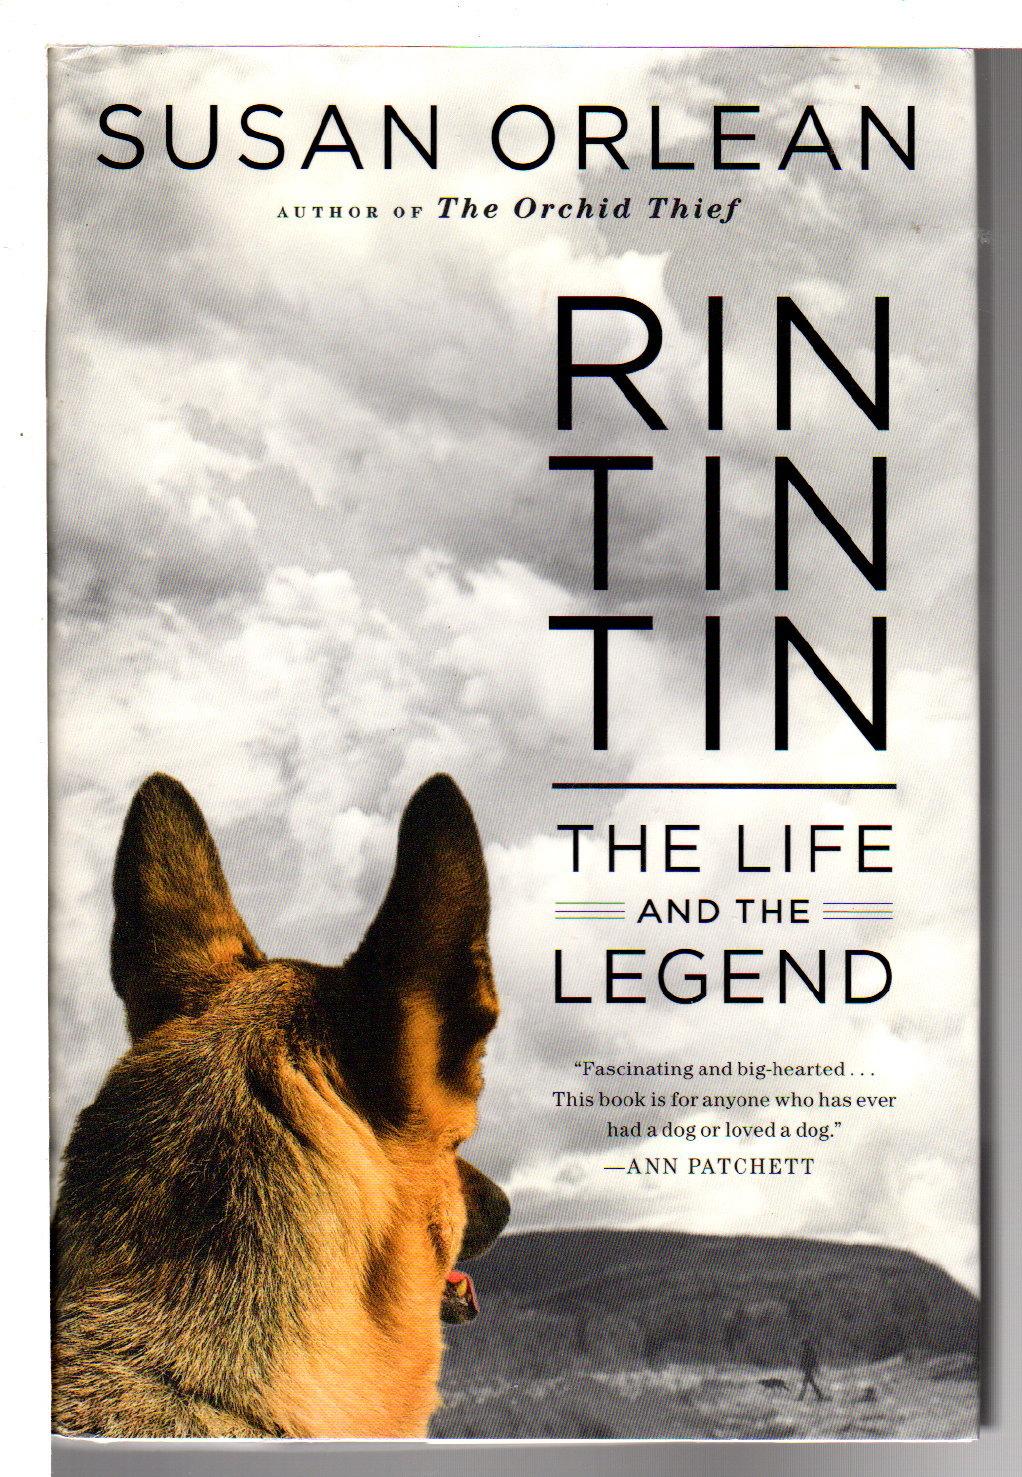 ORLEAN, SUSAN. - RIN TIN TIN: The Life and the Legend.